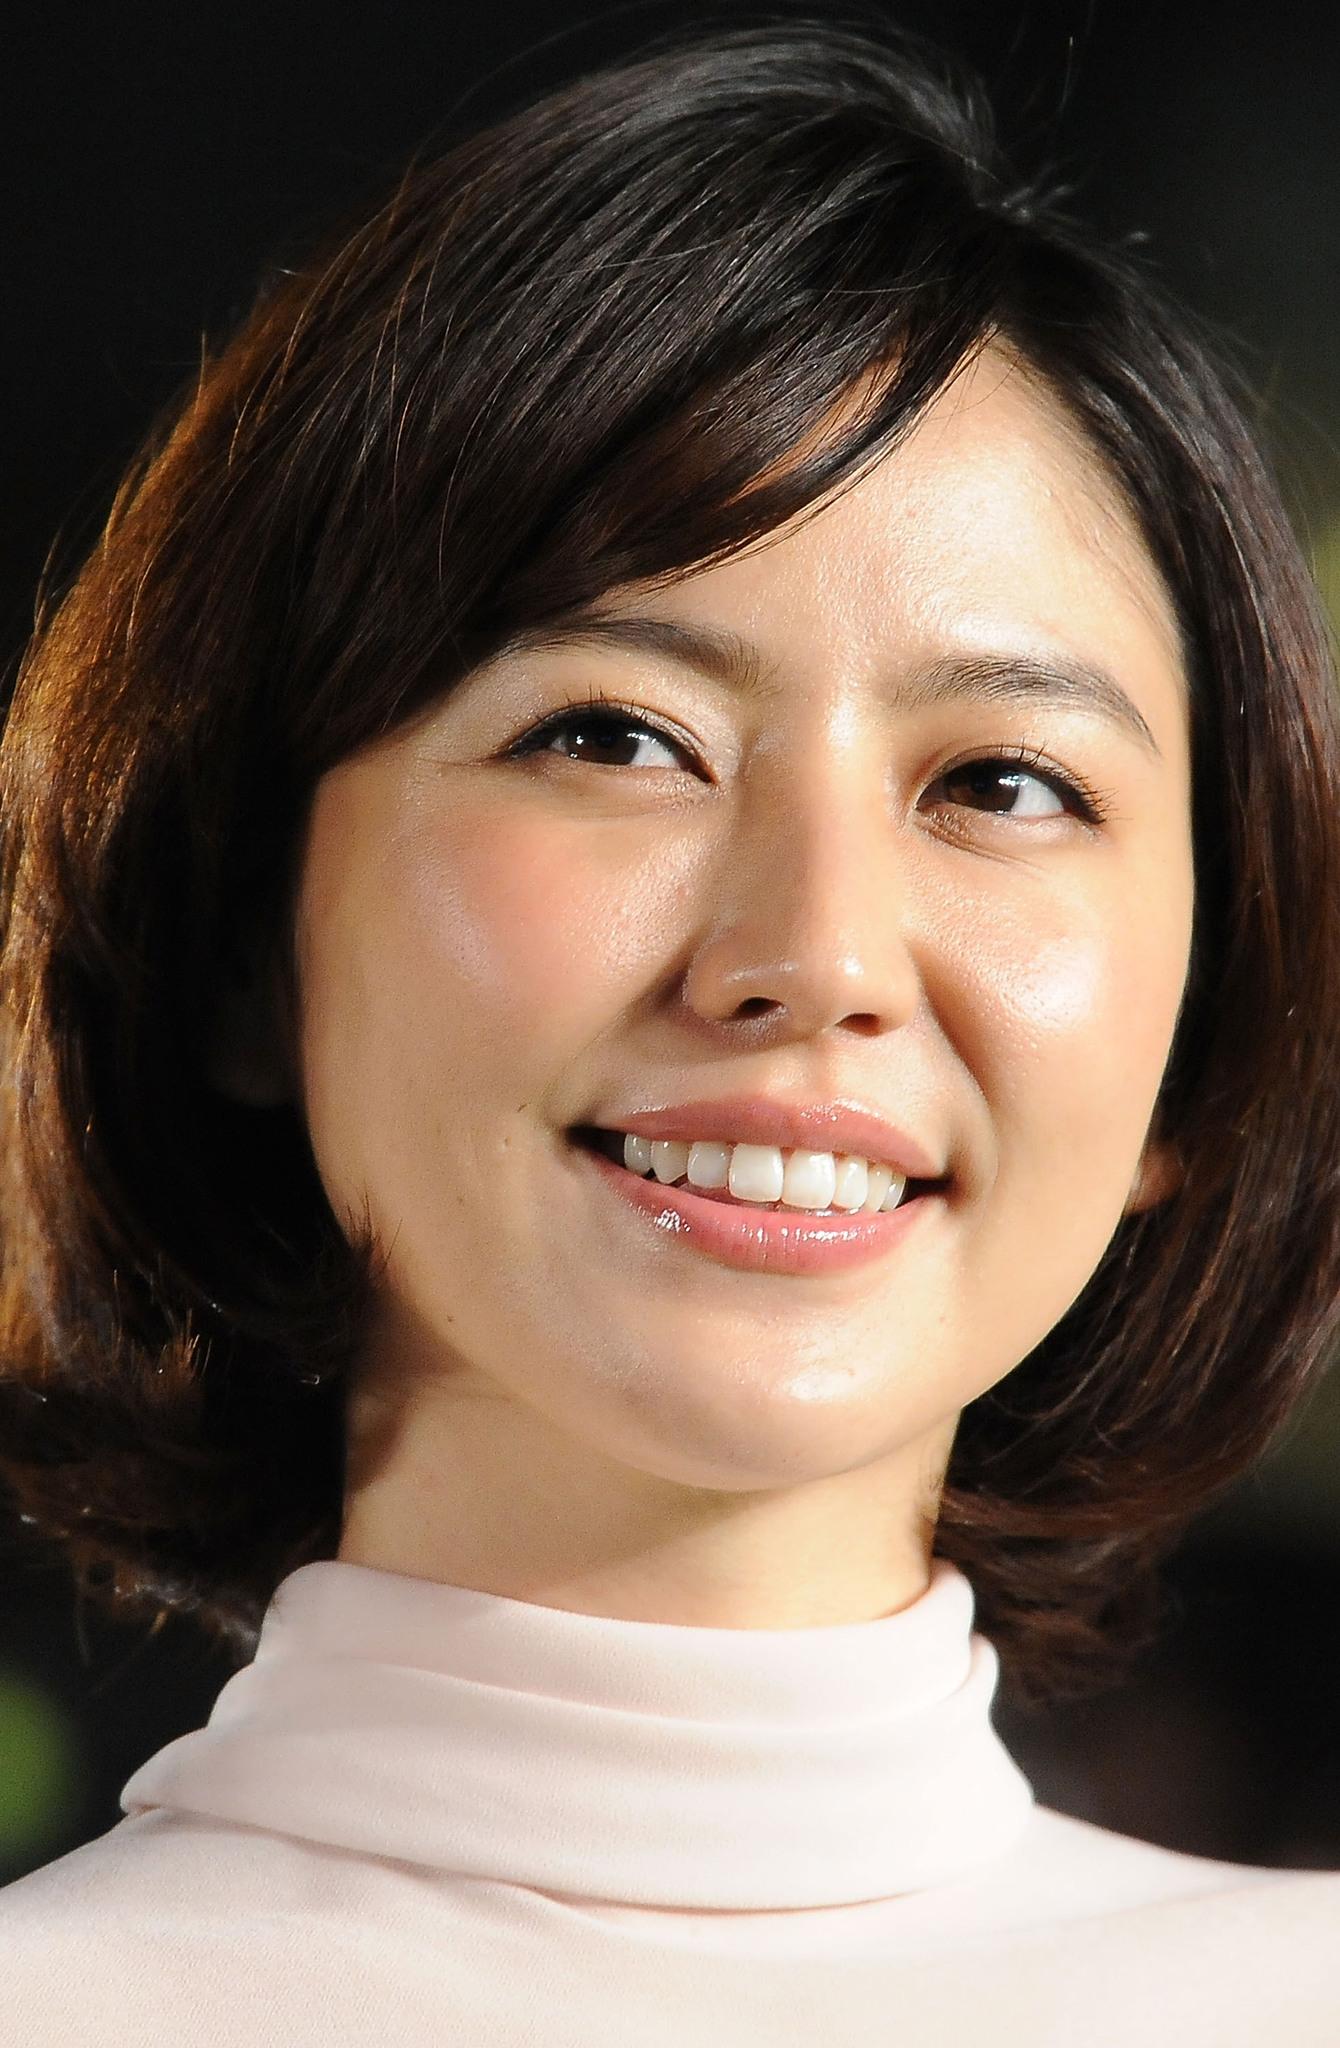 Masami Nagasawa IMDbPro